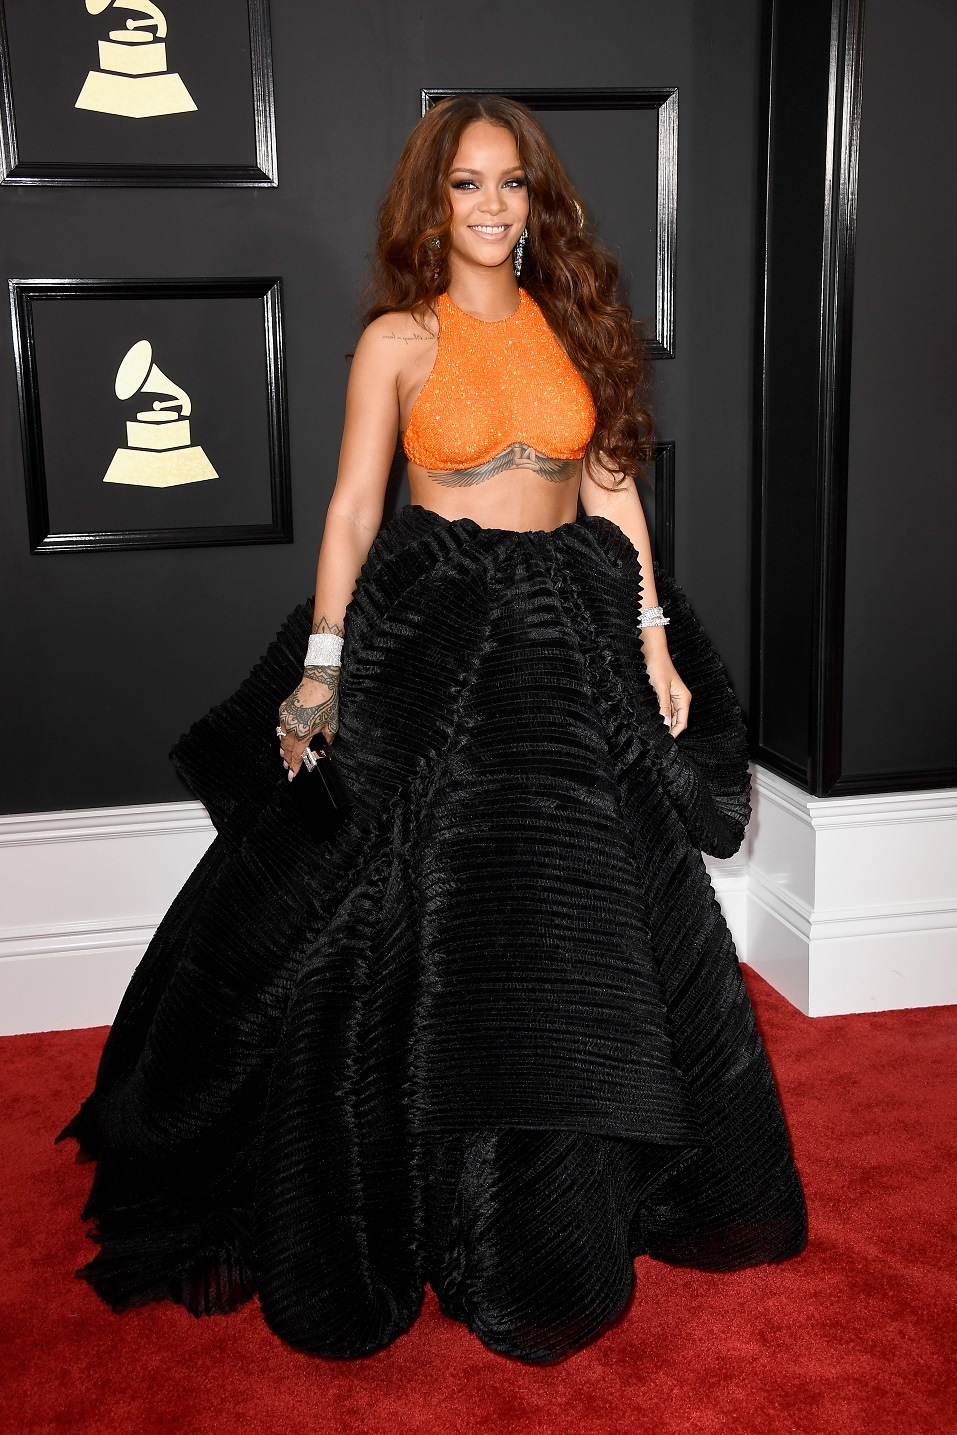 Singer Rihanna attends The 59th GRAMMY Awards